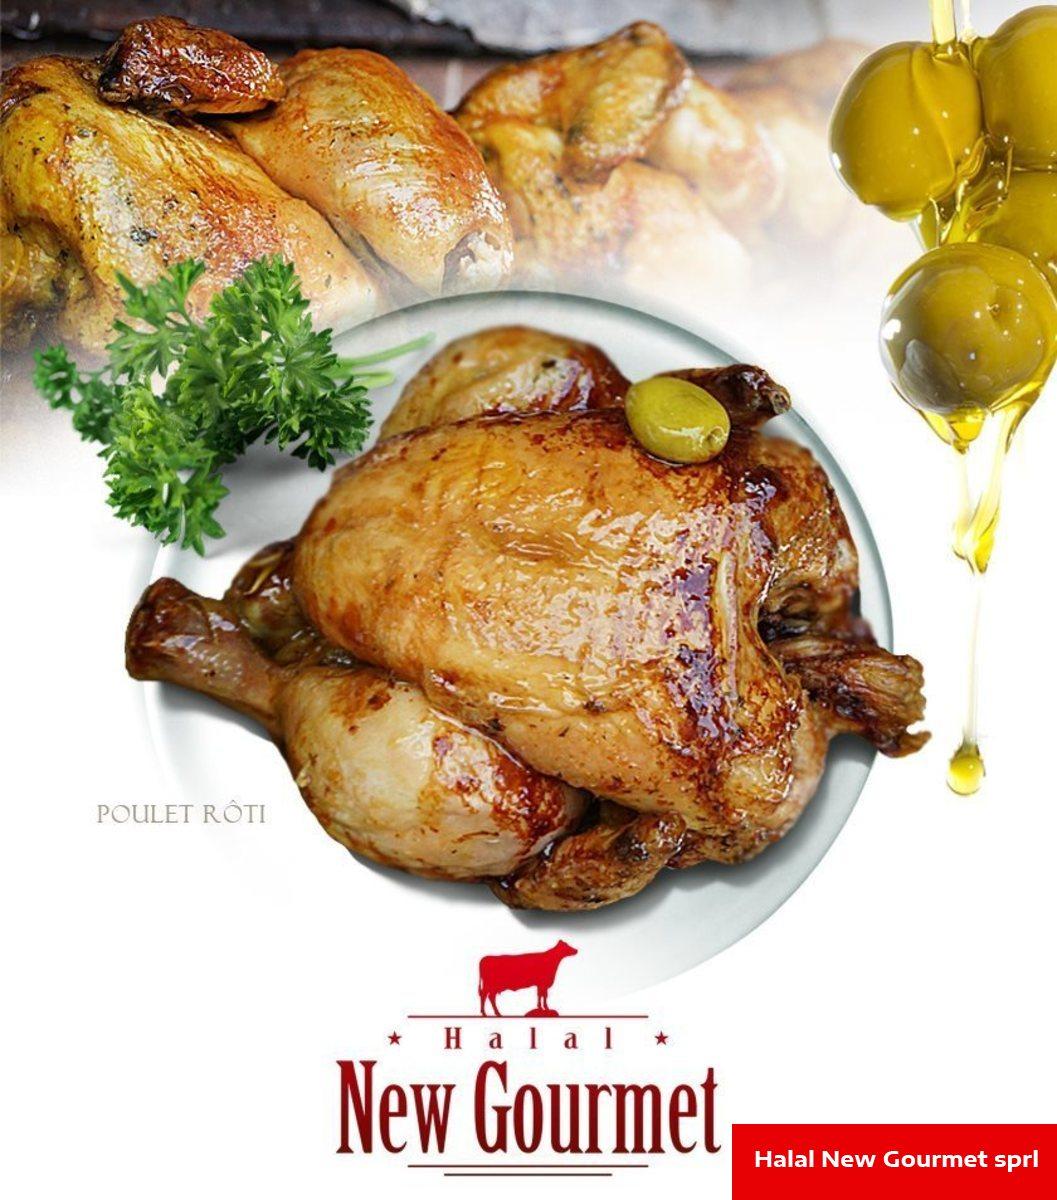 Halal New Gourmet sprl